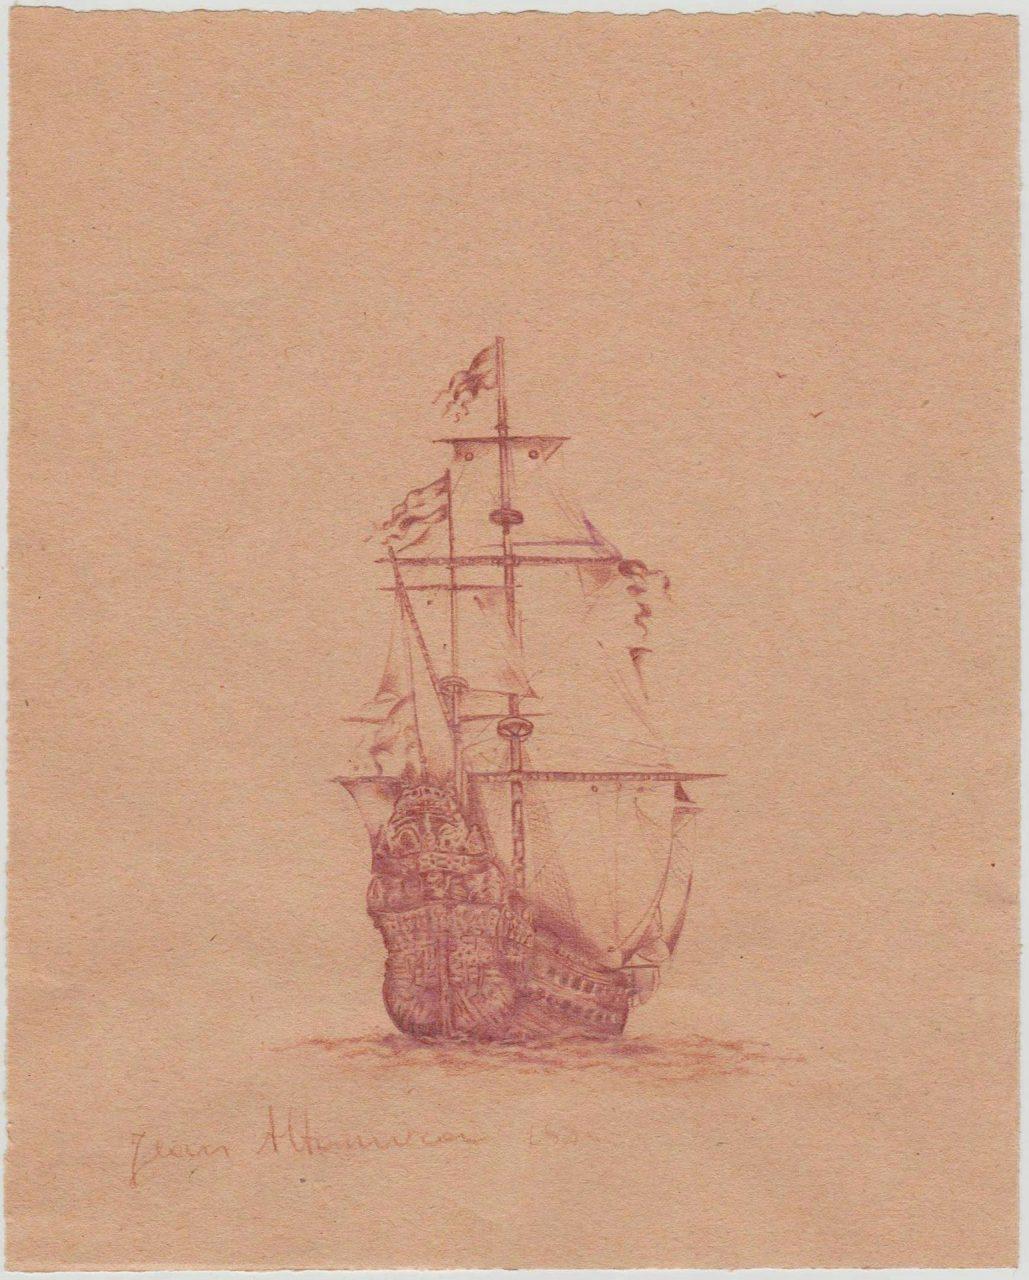 18a ALTAMURA (1852-1878) paper 18x15